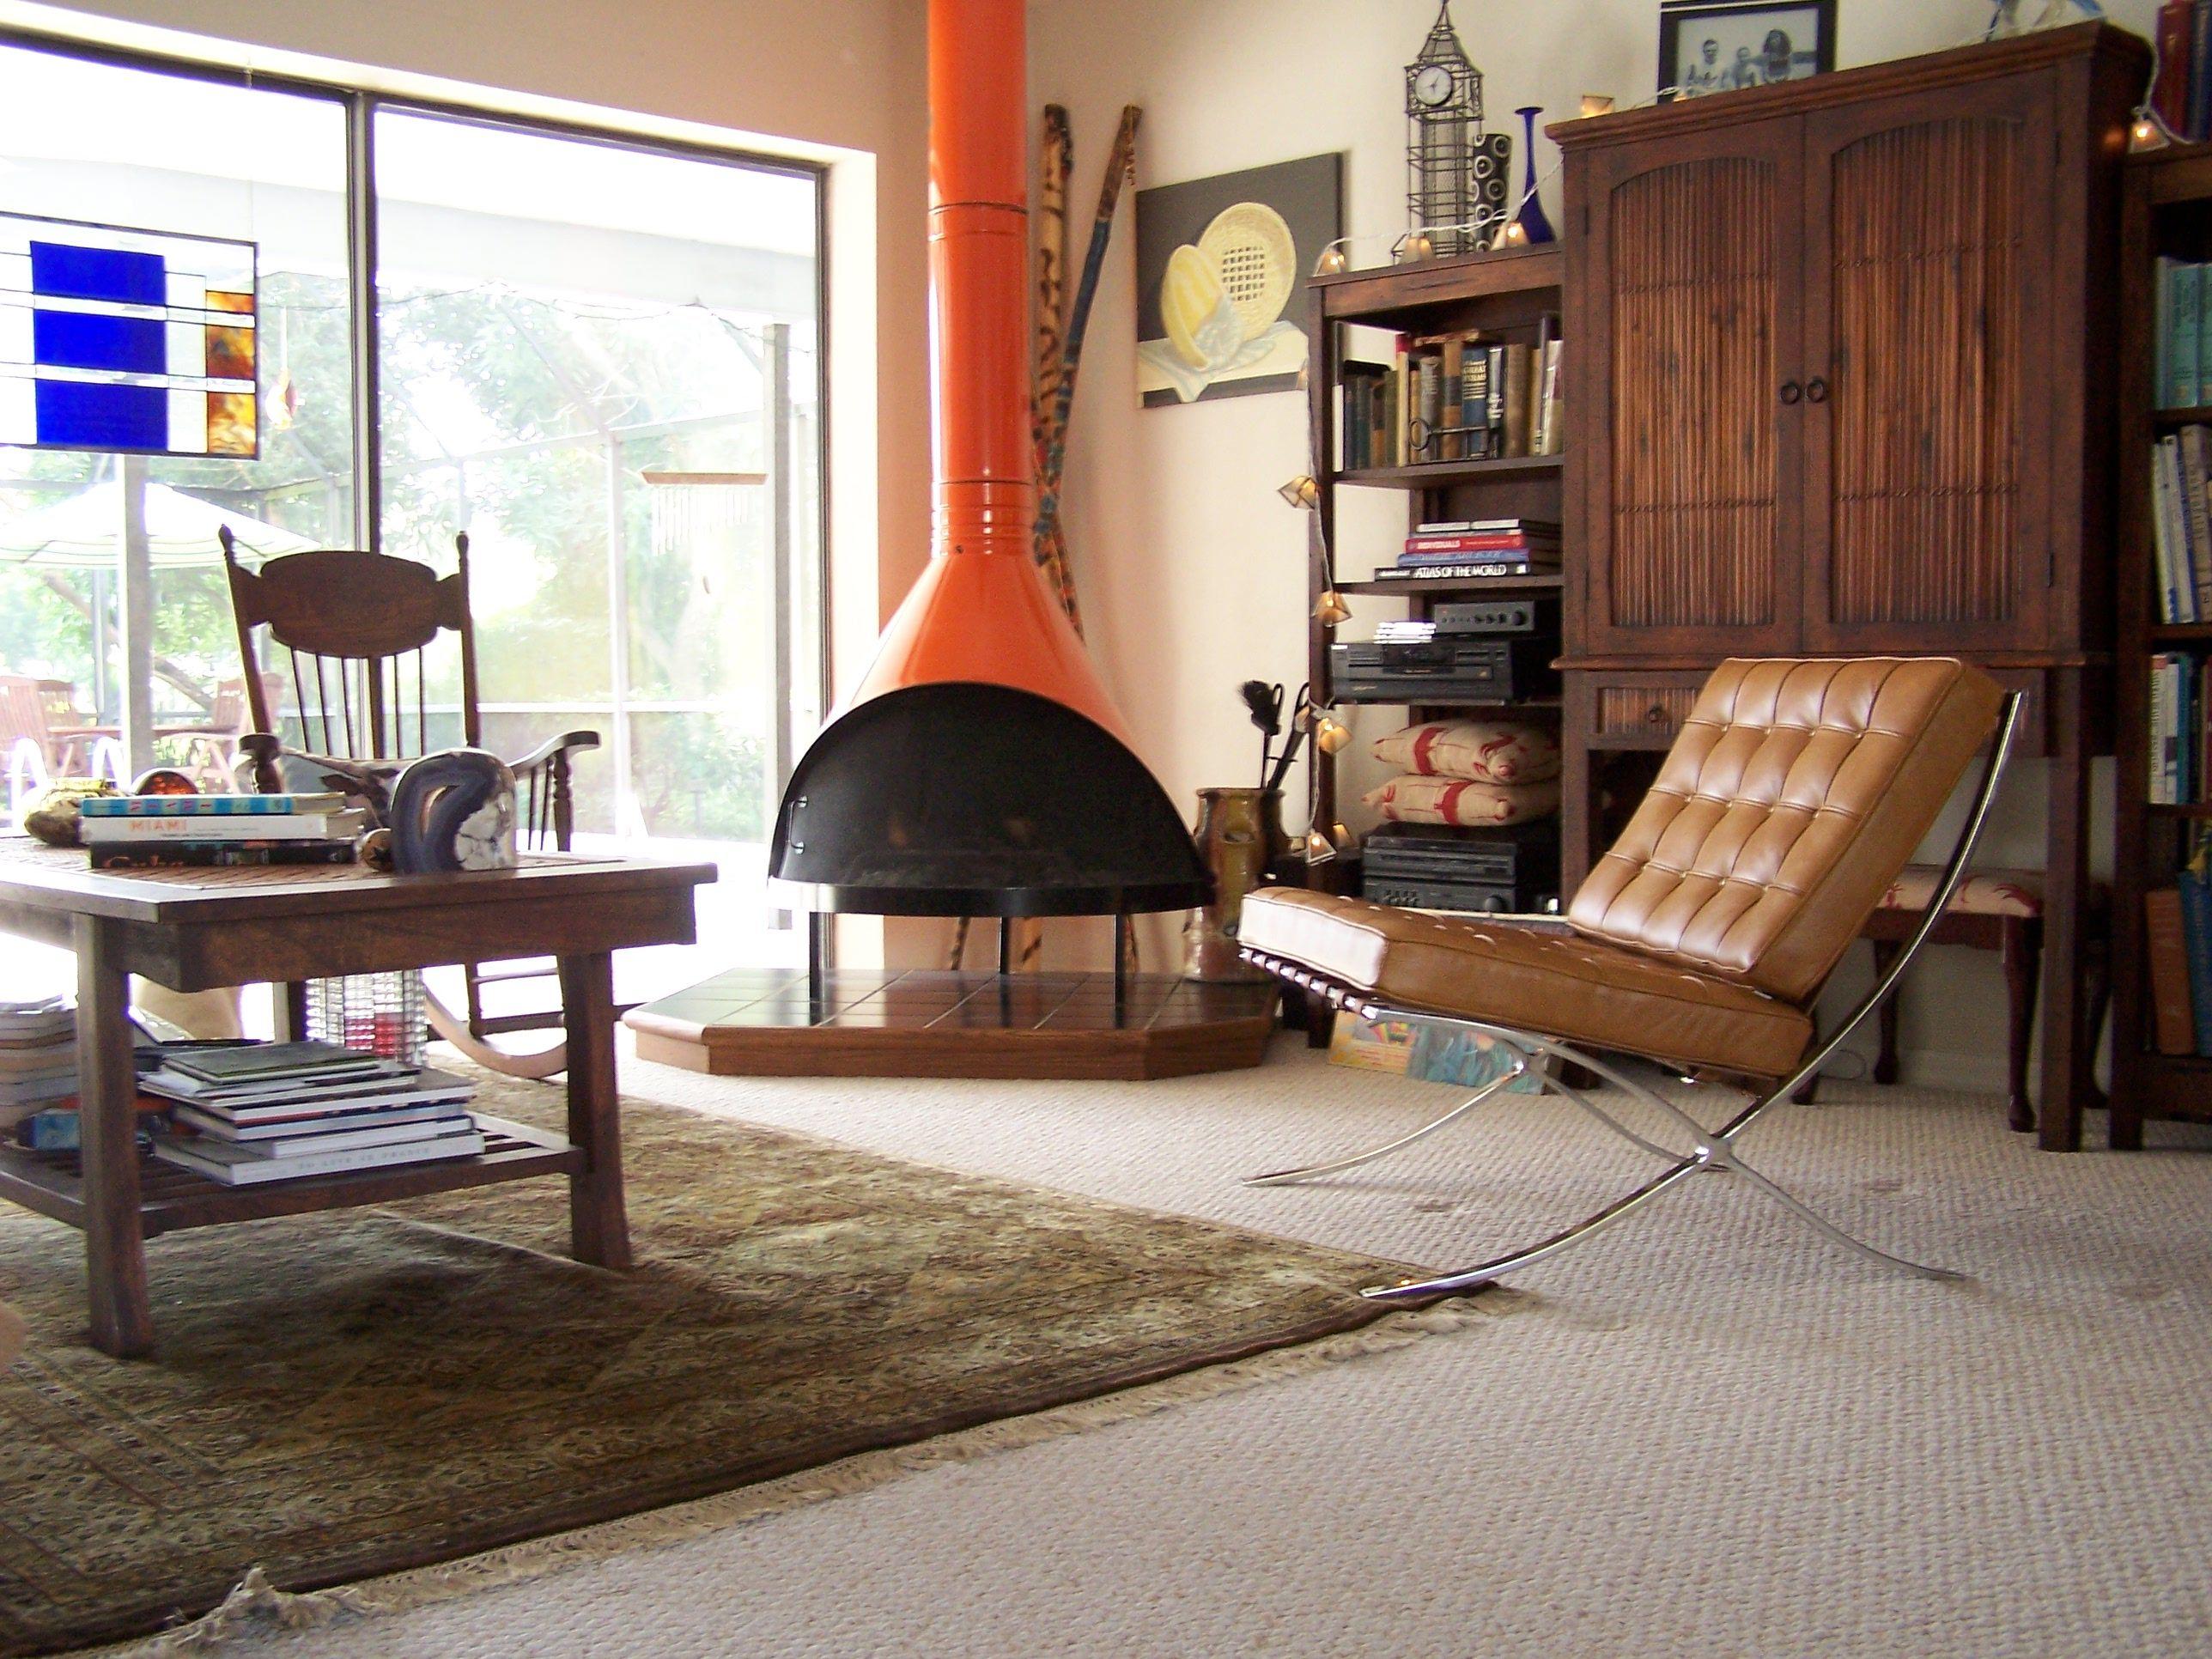 Modern Furniture Classics mcm wood stove | mid-century modern furniture classics | pinterest